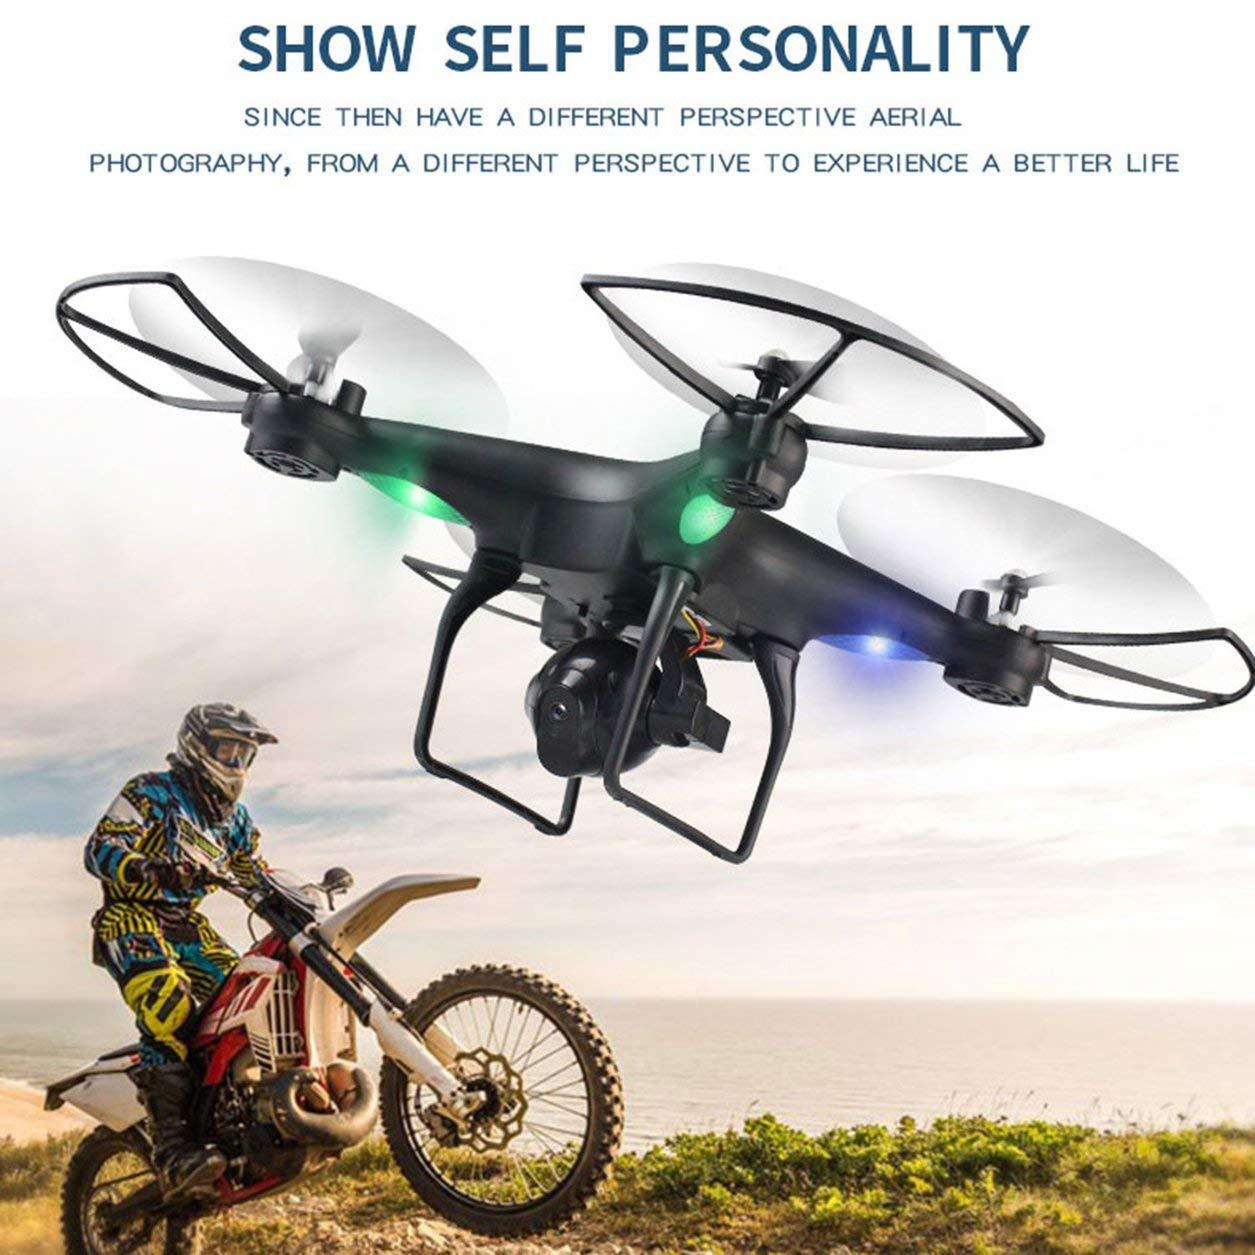 Dailyinshop D68W-3 720 P HD WiFi Kamera FPV RC Drone mit Höhe Halten Headless Modus (Farbe: Schwarz)